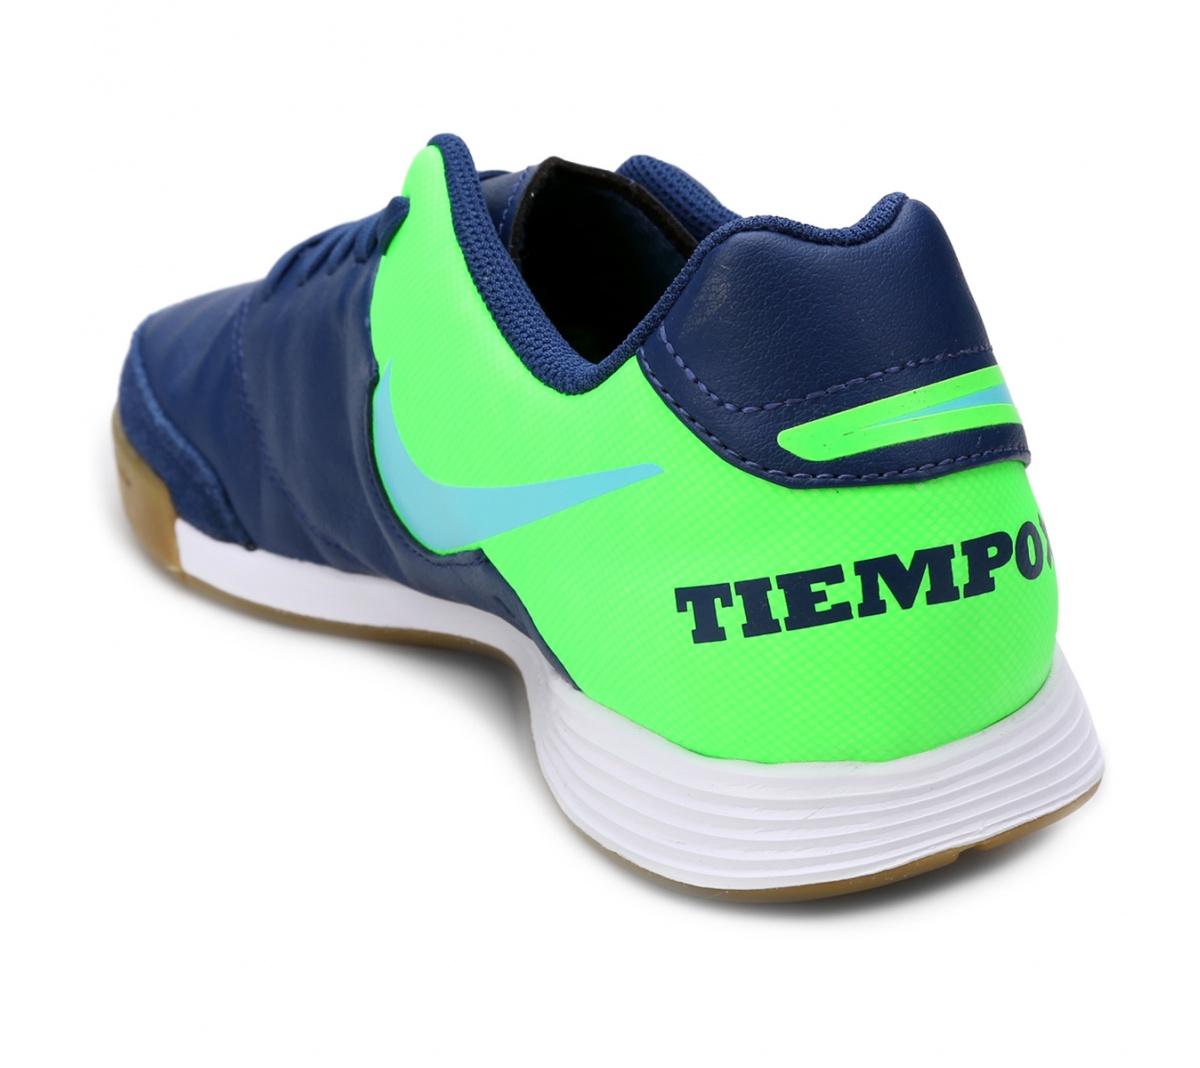 Tênis TiempoX Gênio II Leather Futsal - Mundo do Futebol 790e8cf5a51d5